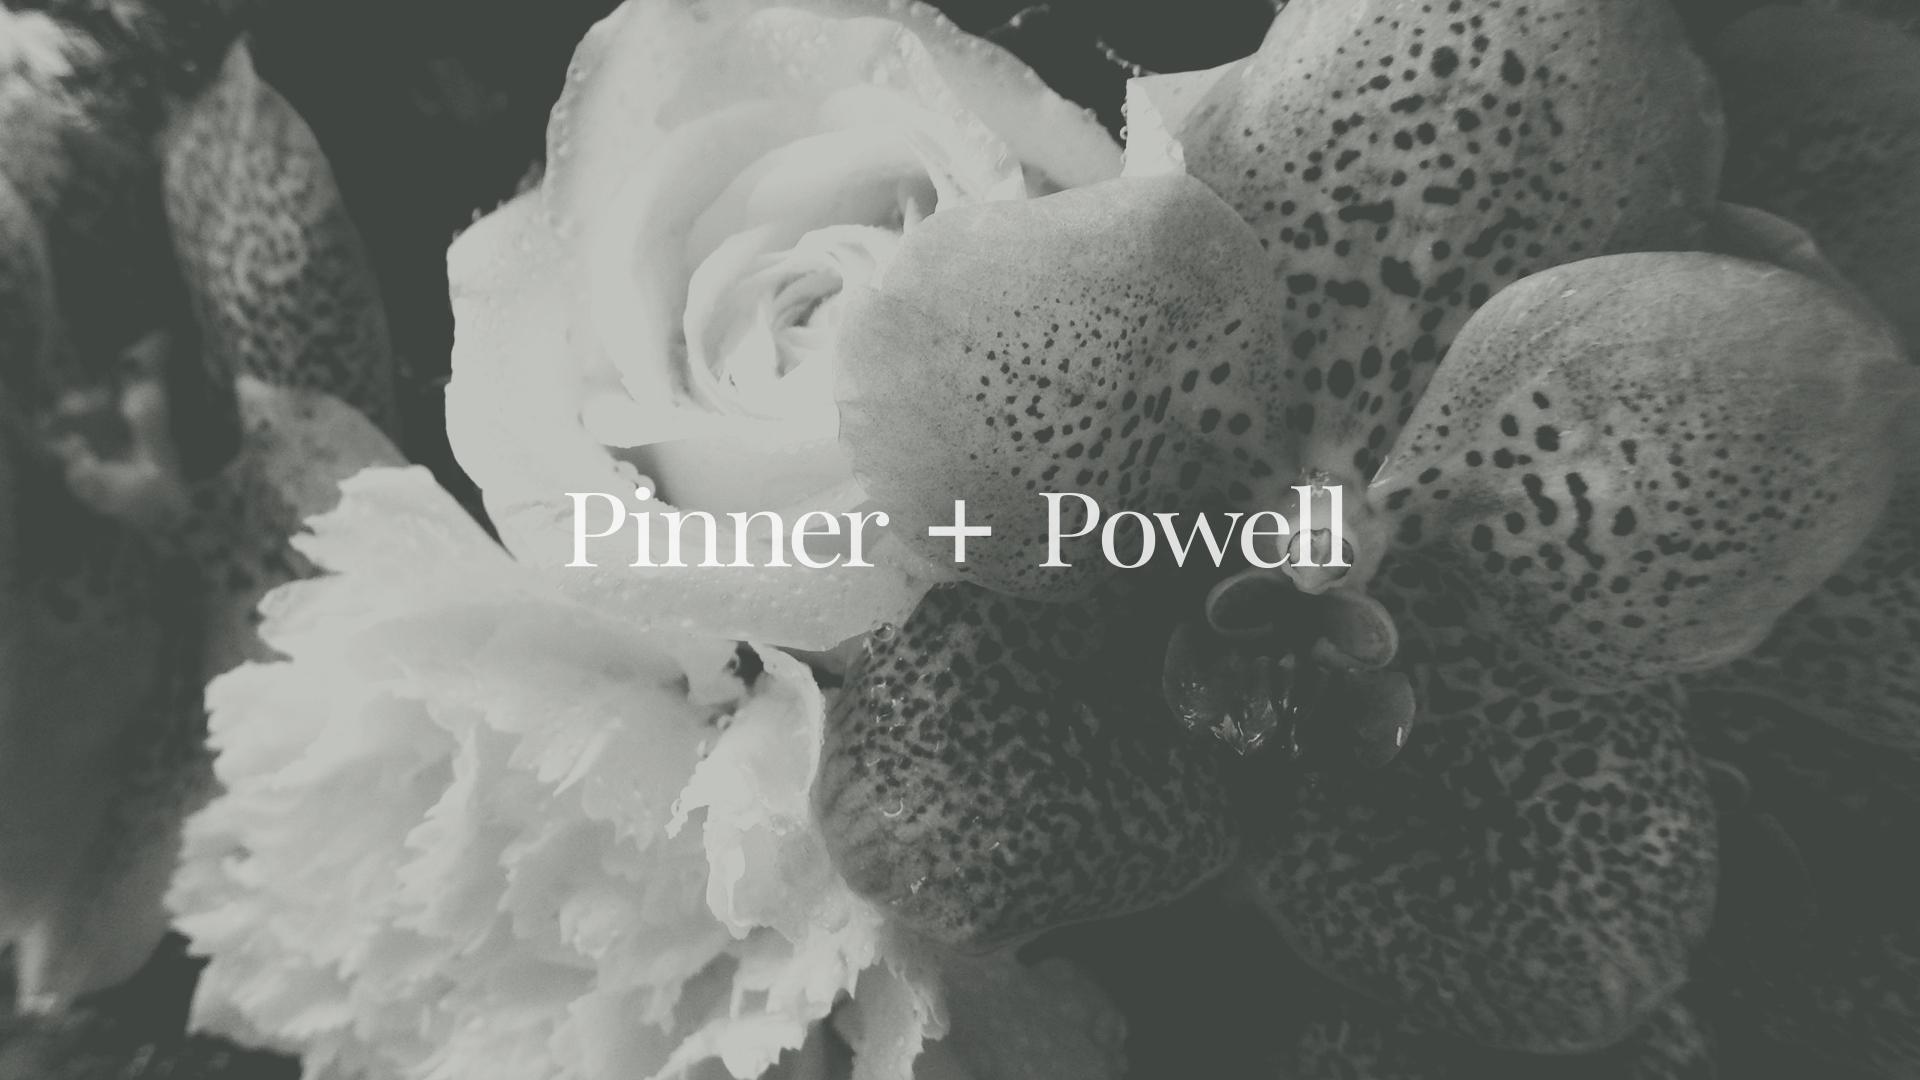 pinnerpowell brand image